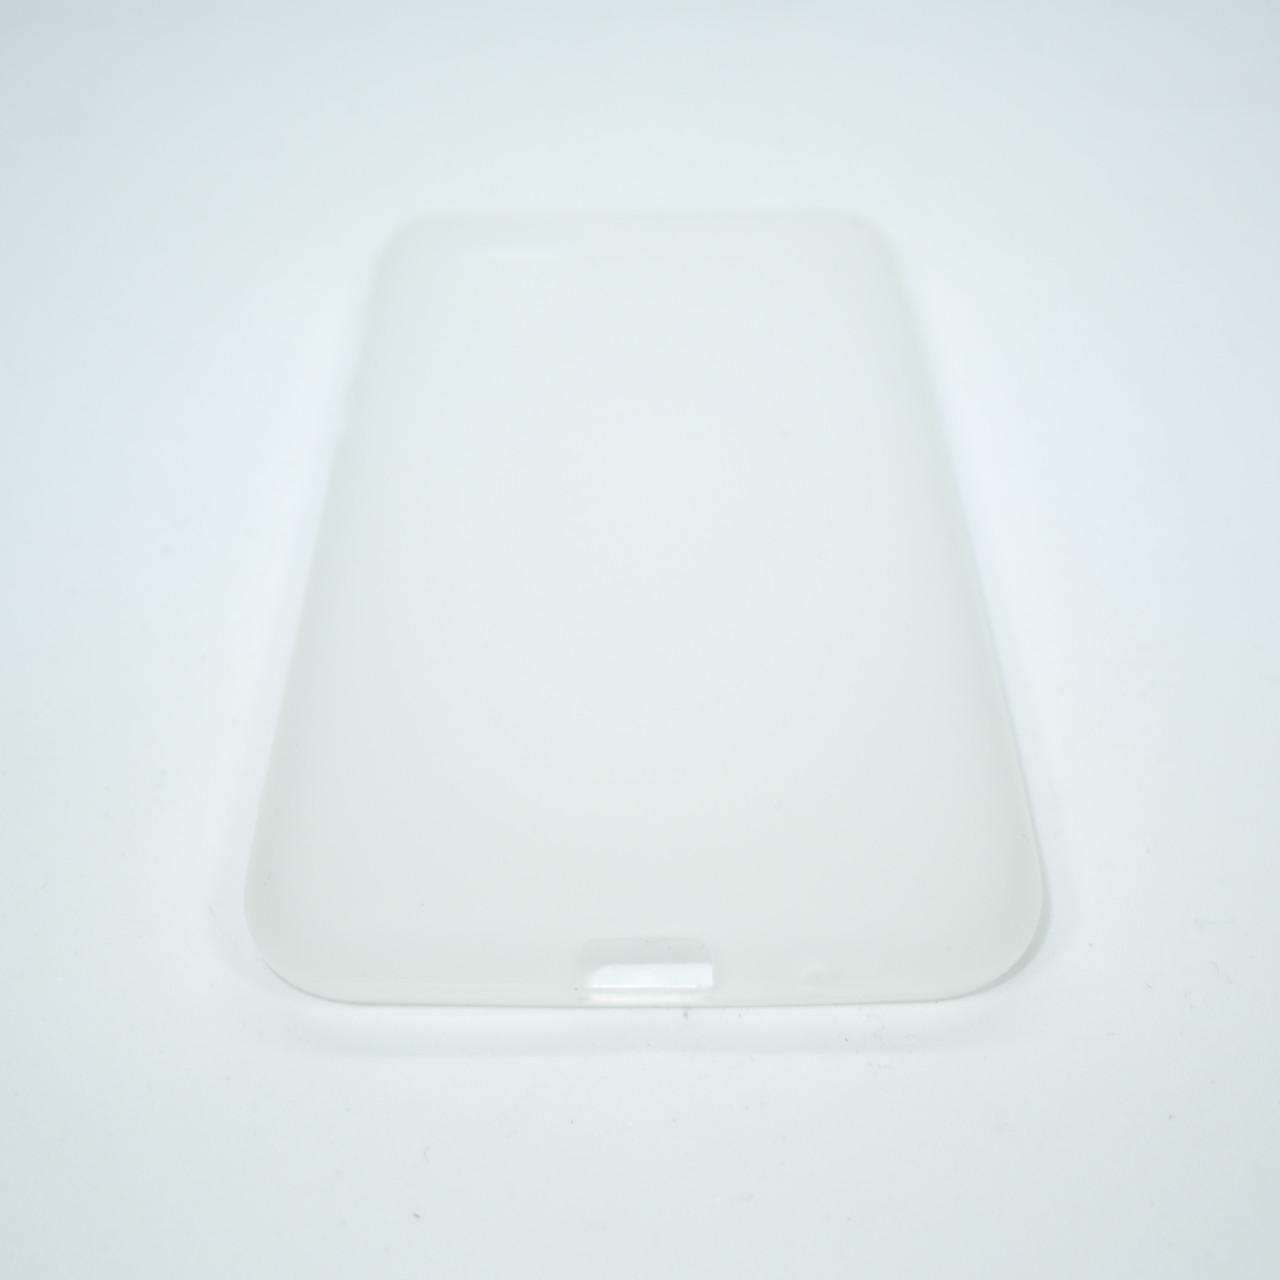 Чехол TPU Huawei Y5 Для телефона